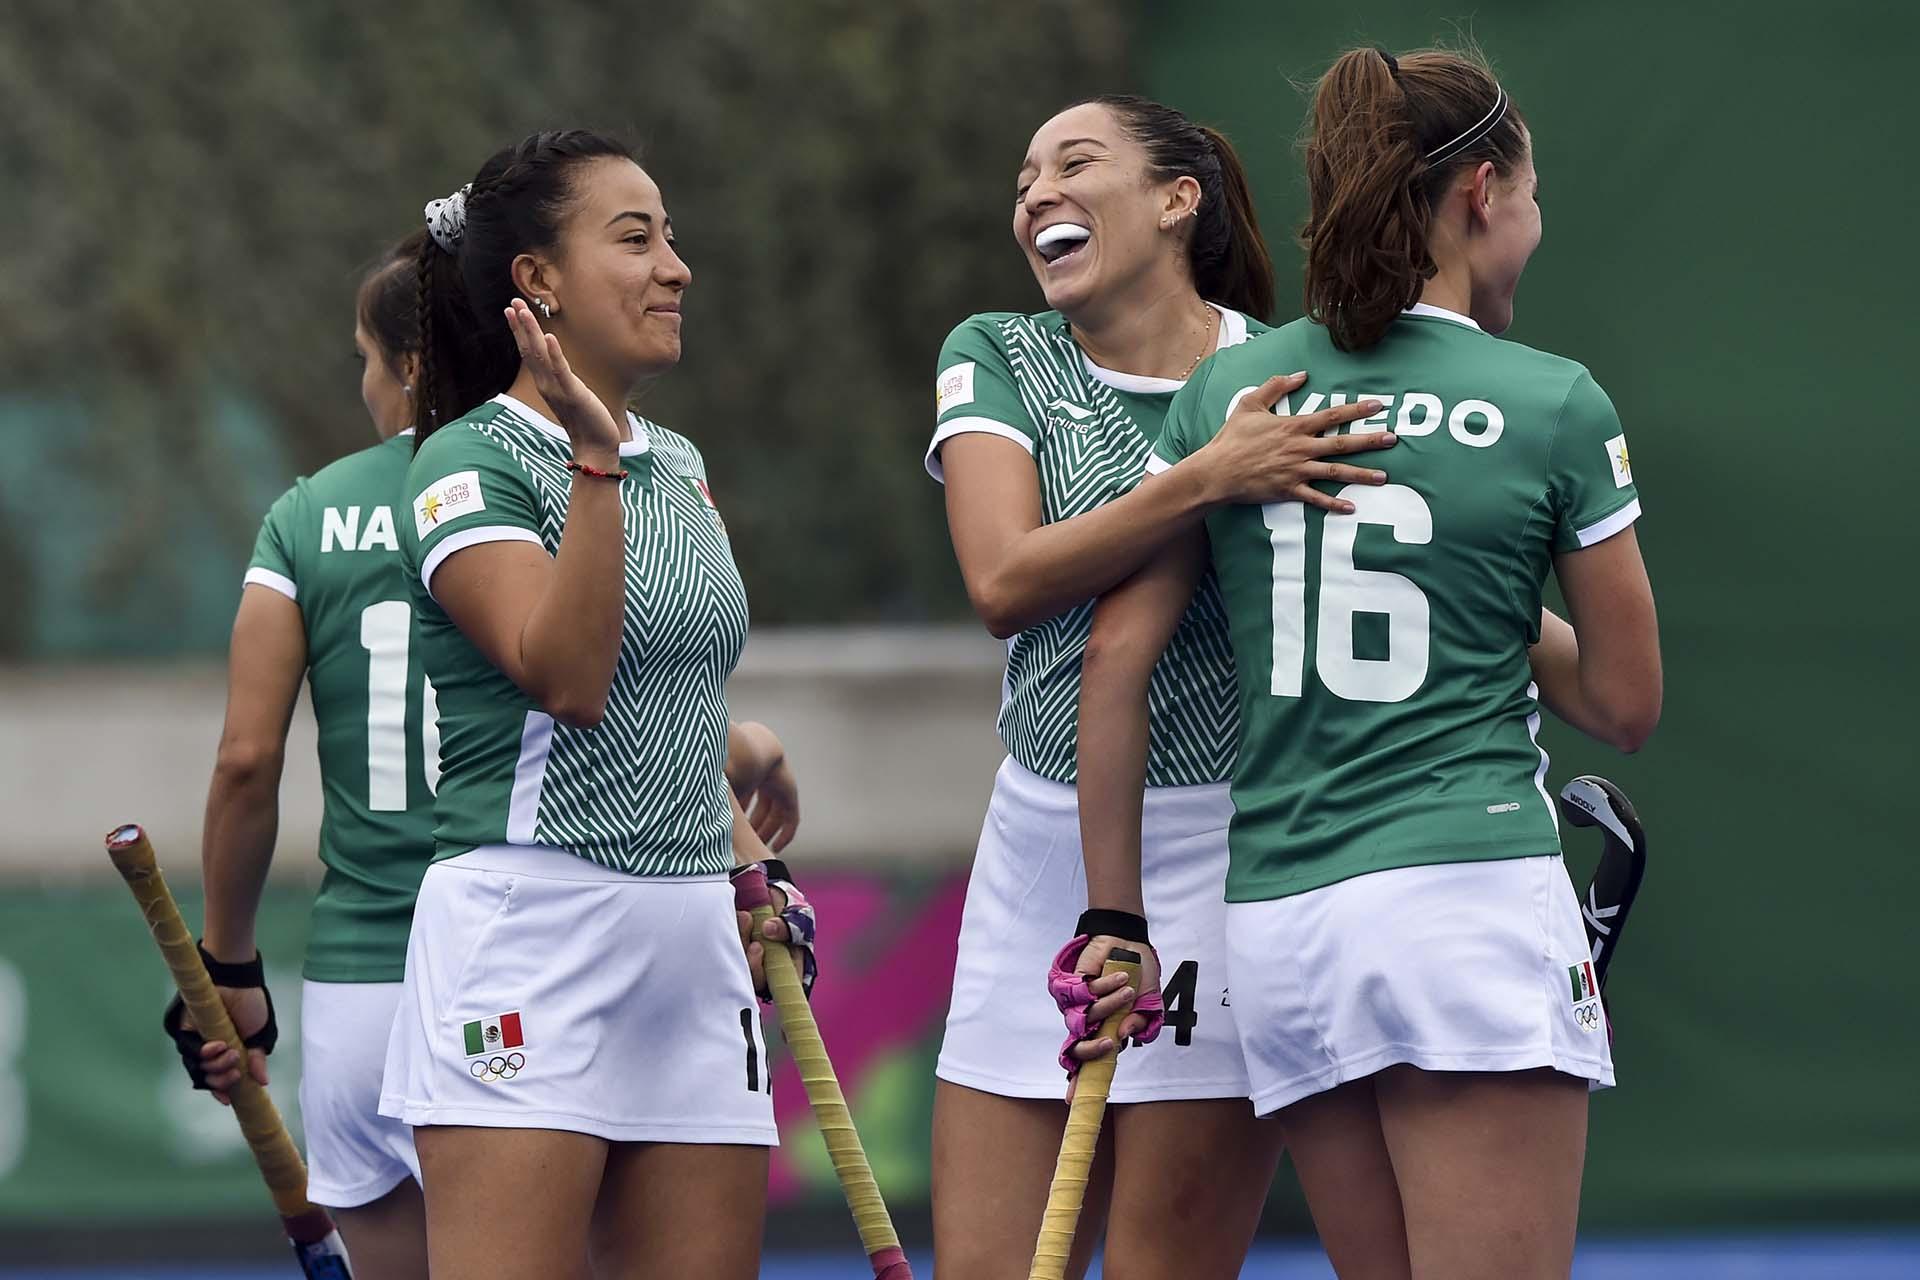 Las jugadors de México festejan el triunfo frente a Perú en Hockey.(Photo by Cris BOURONCLE / AFP)